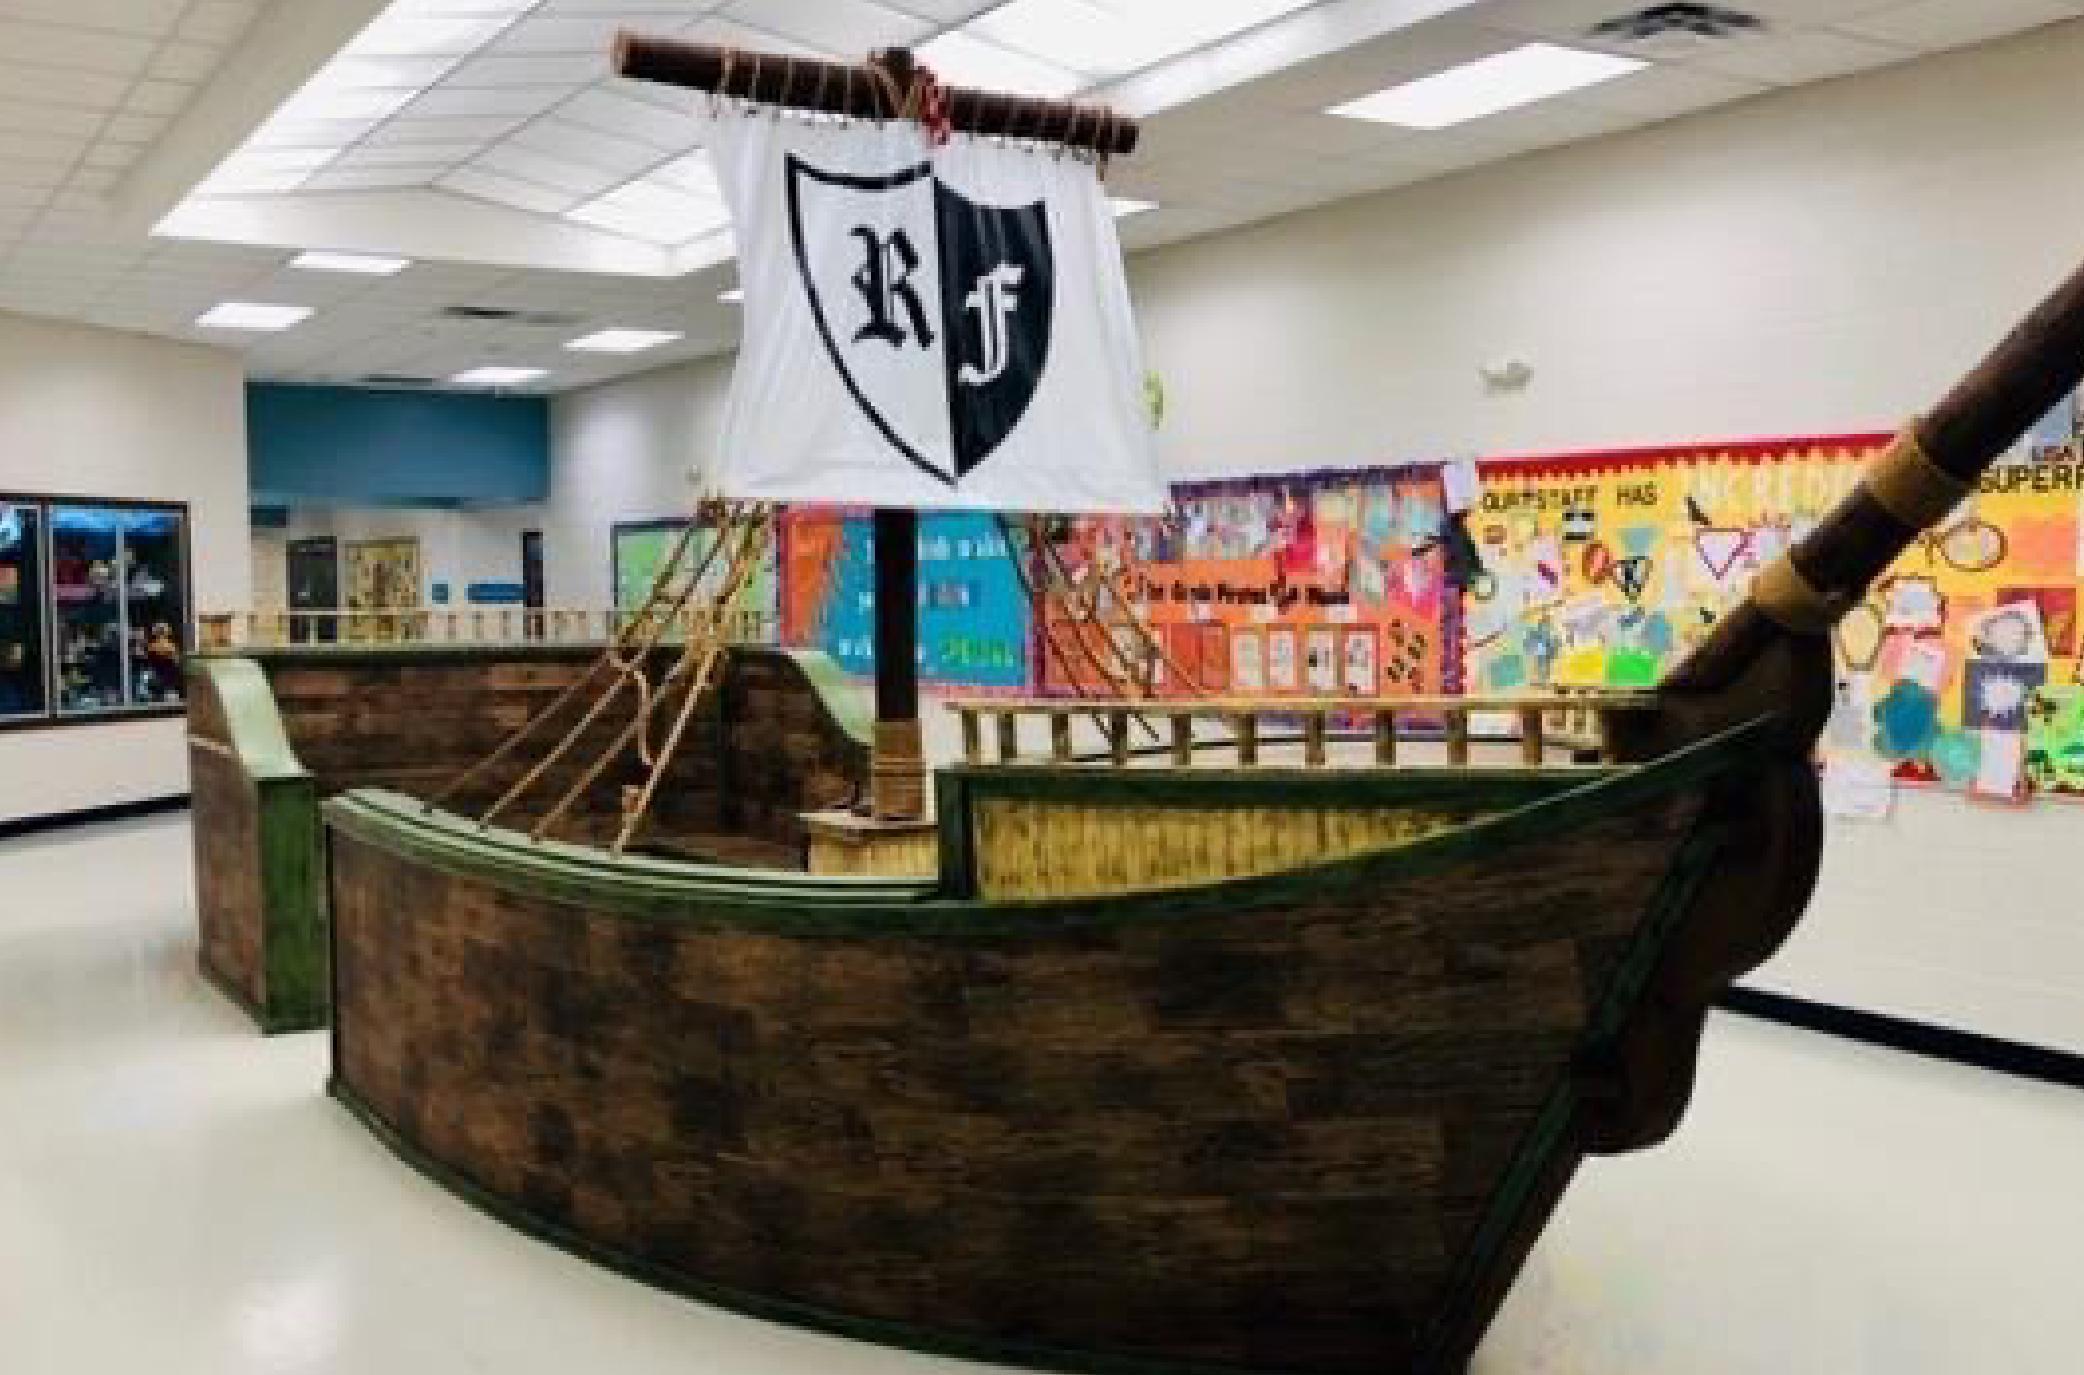 Live Oak Learning Center Pirate Ship